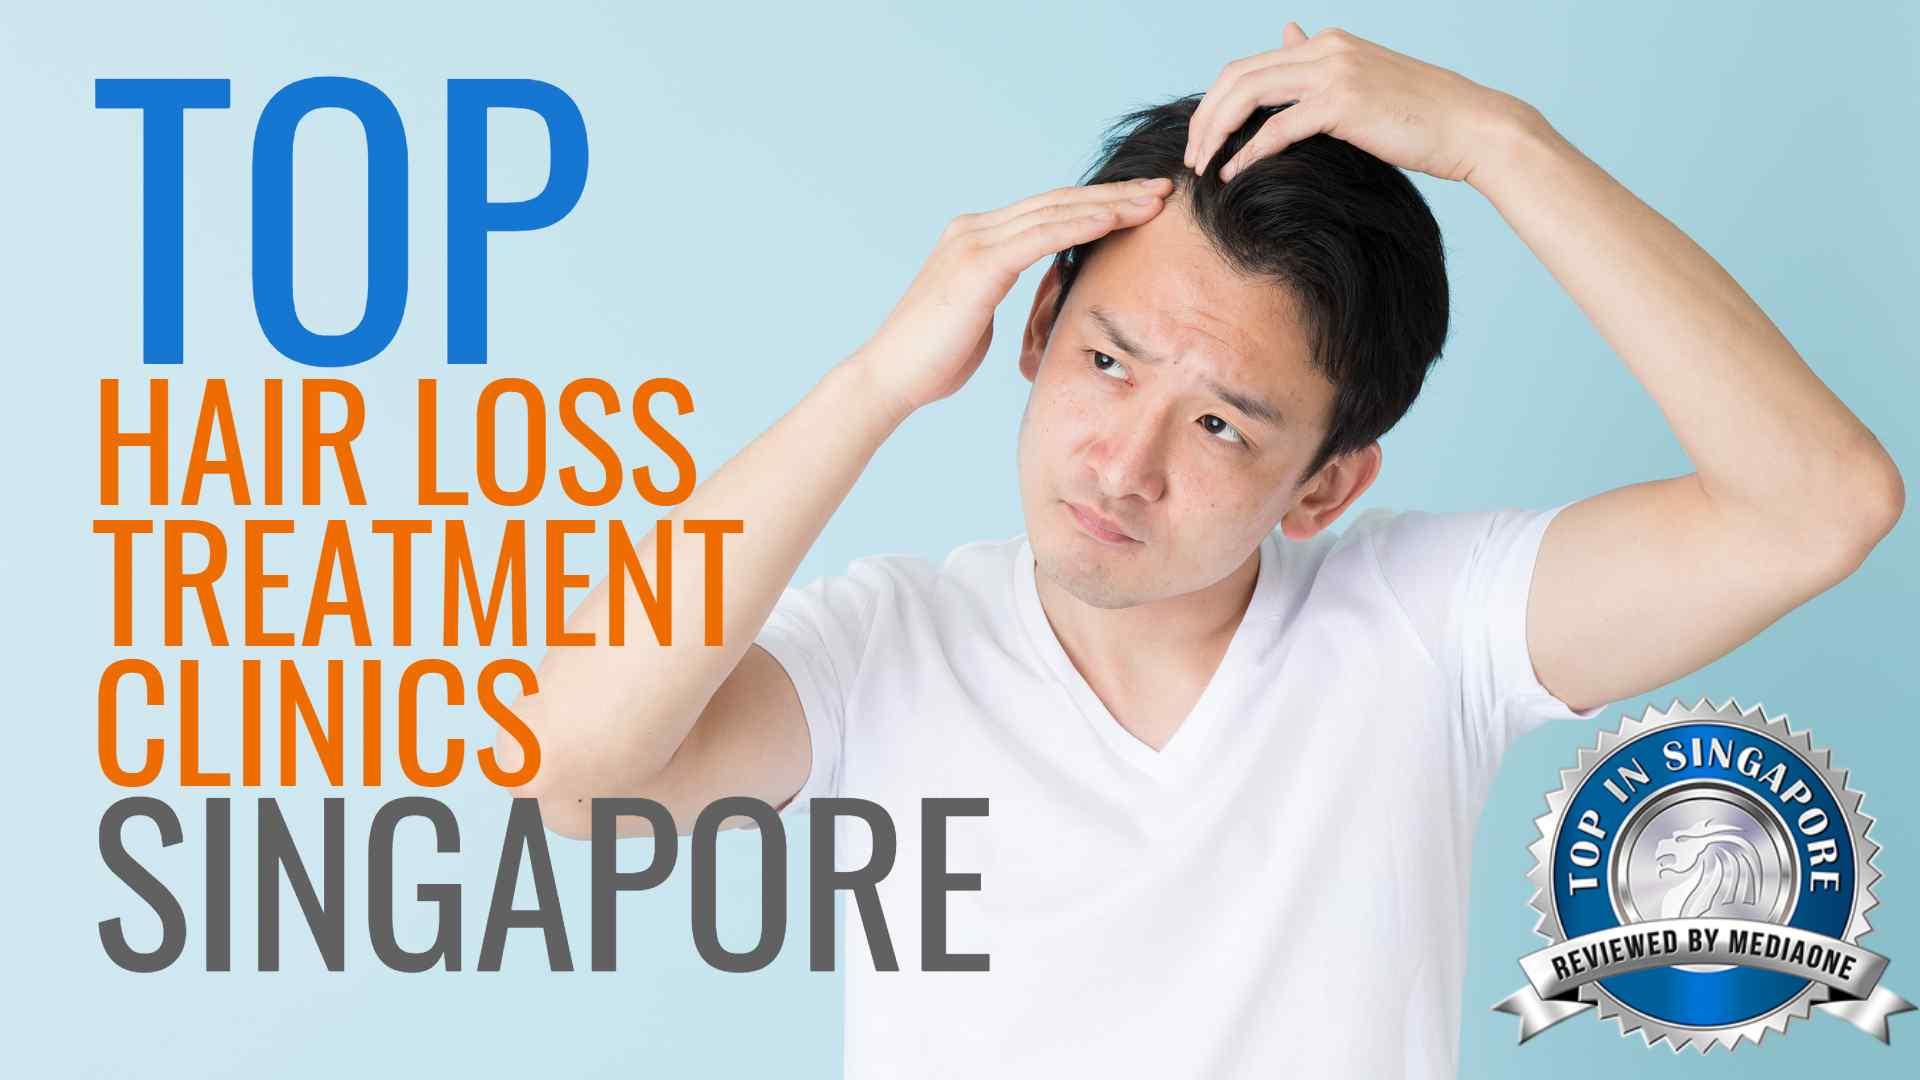 Top Hair Loss Treatment Clinics in Singapore